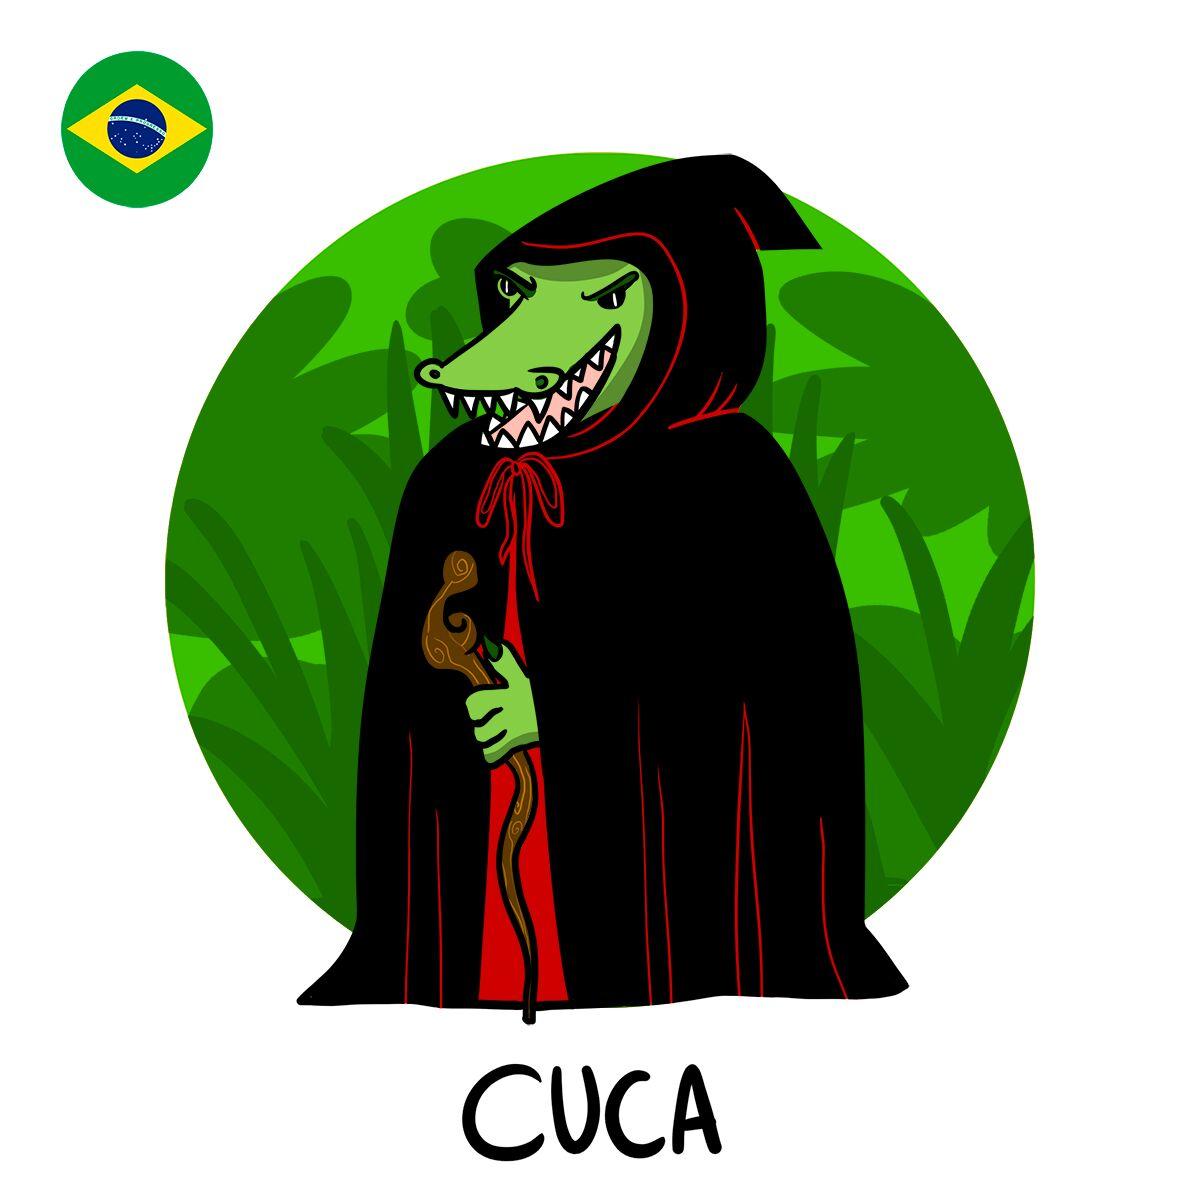 bicho-papão brasil